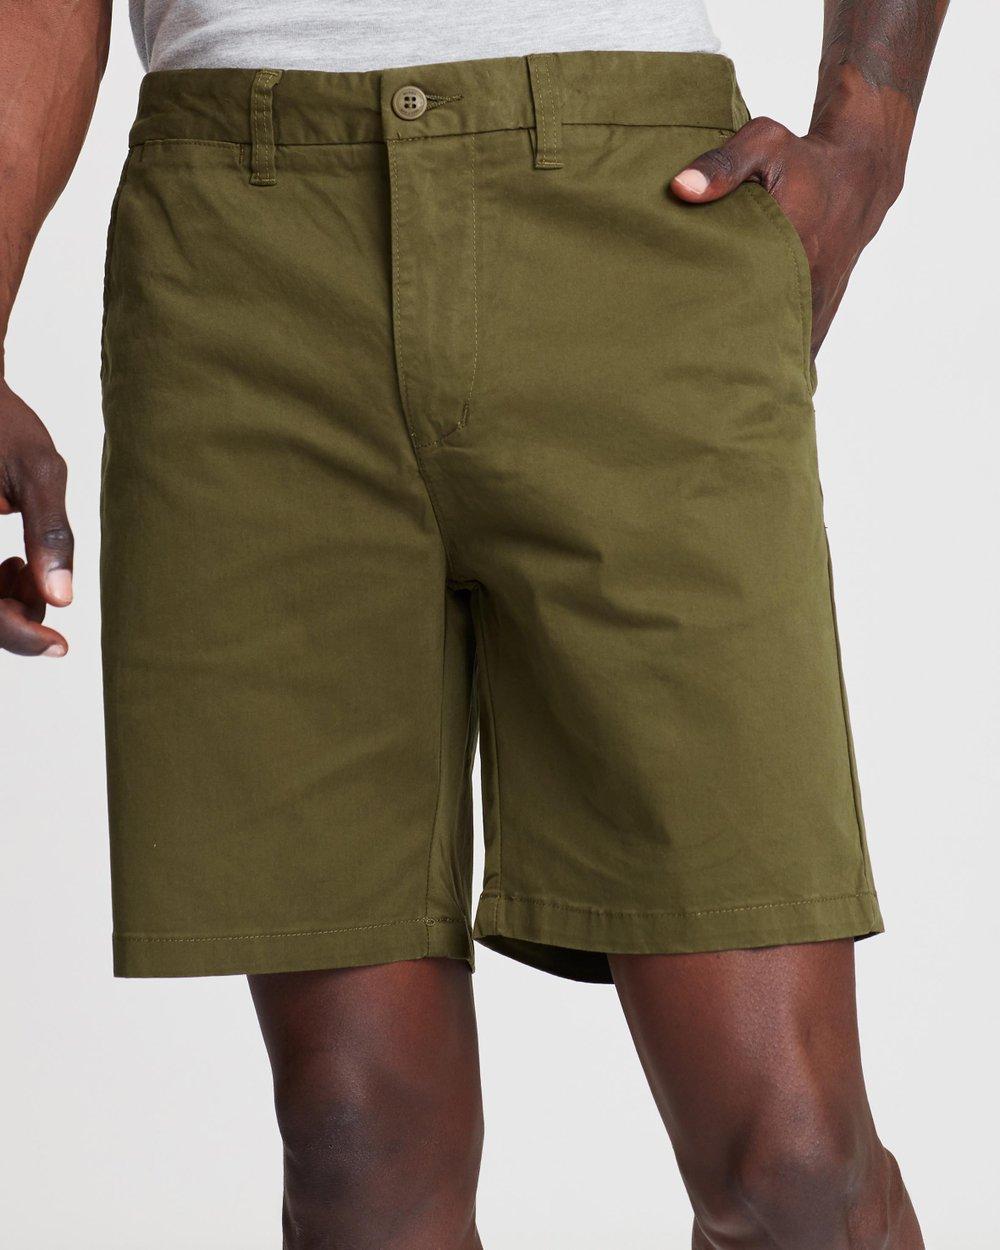 e40a34520 Good Stock Chino Walk Shorts